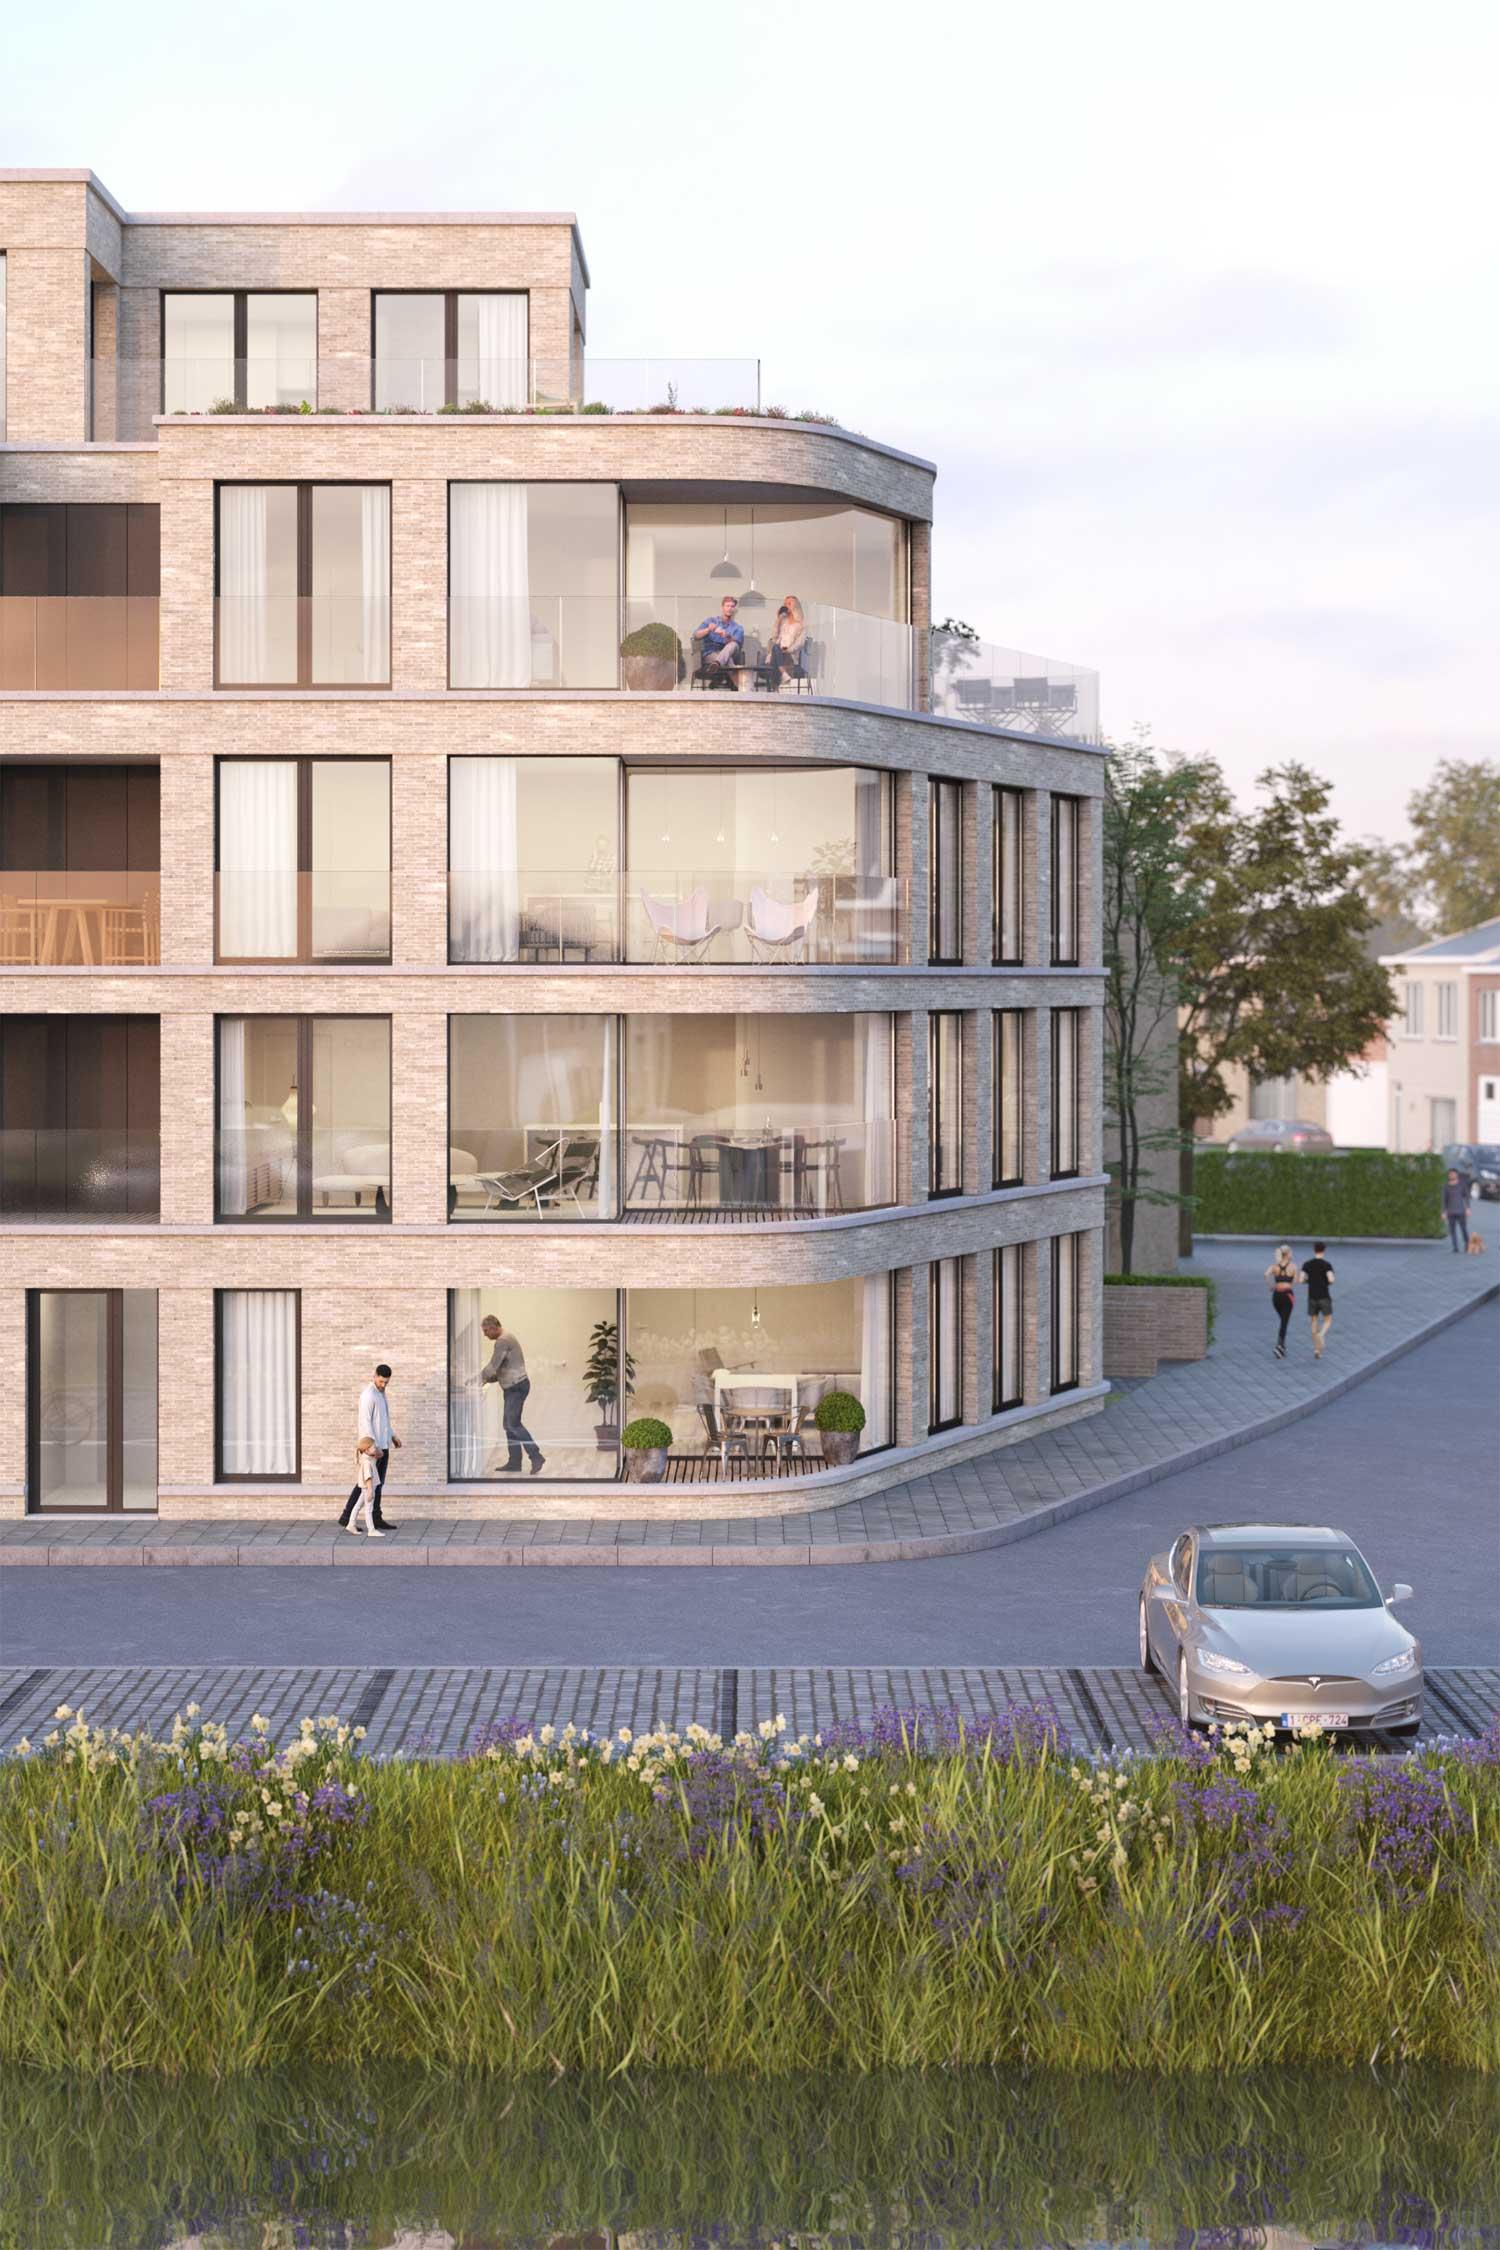 Hook, WOONN, development, Veurne, Rozendalstraat